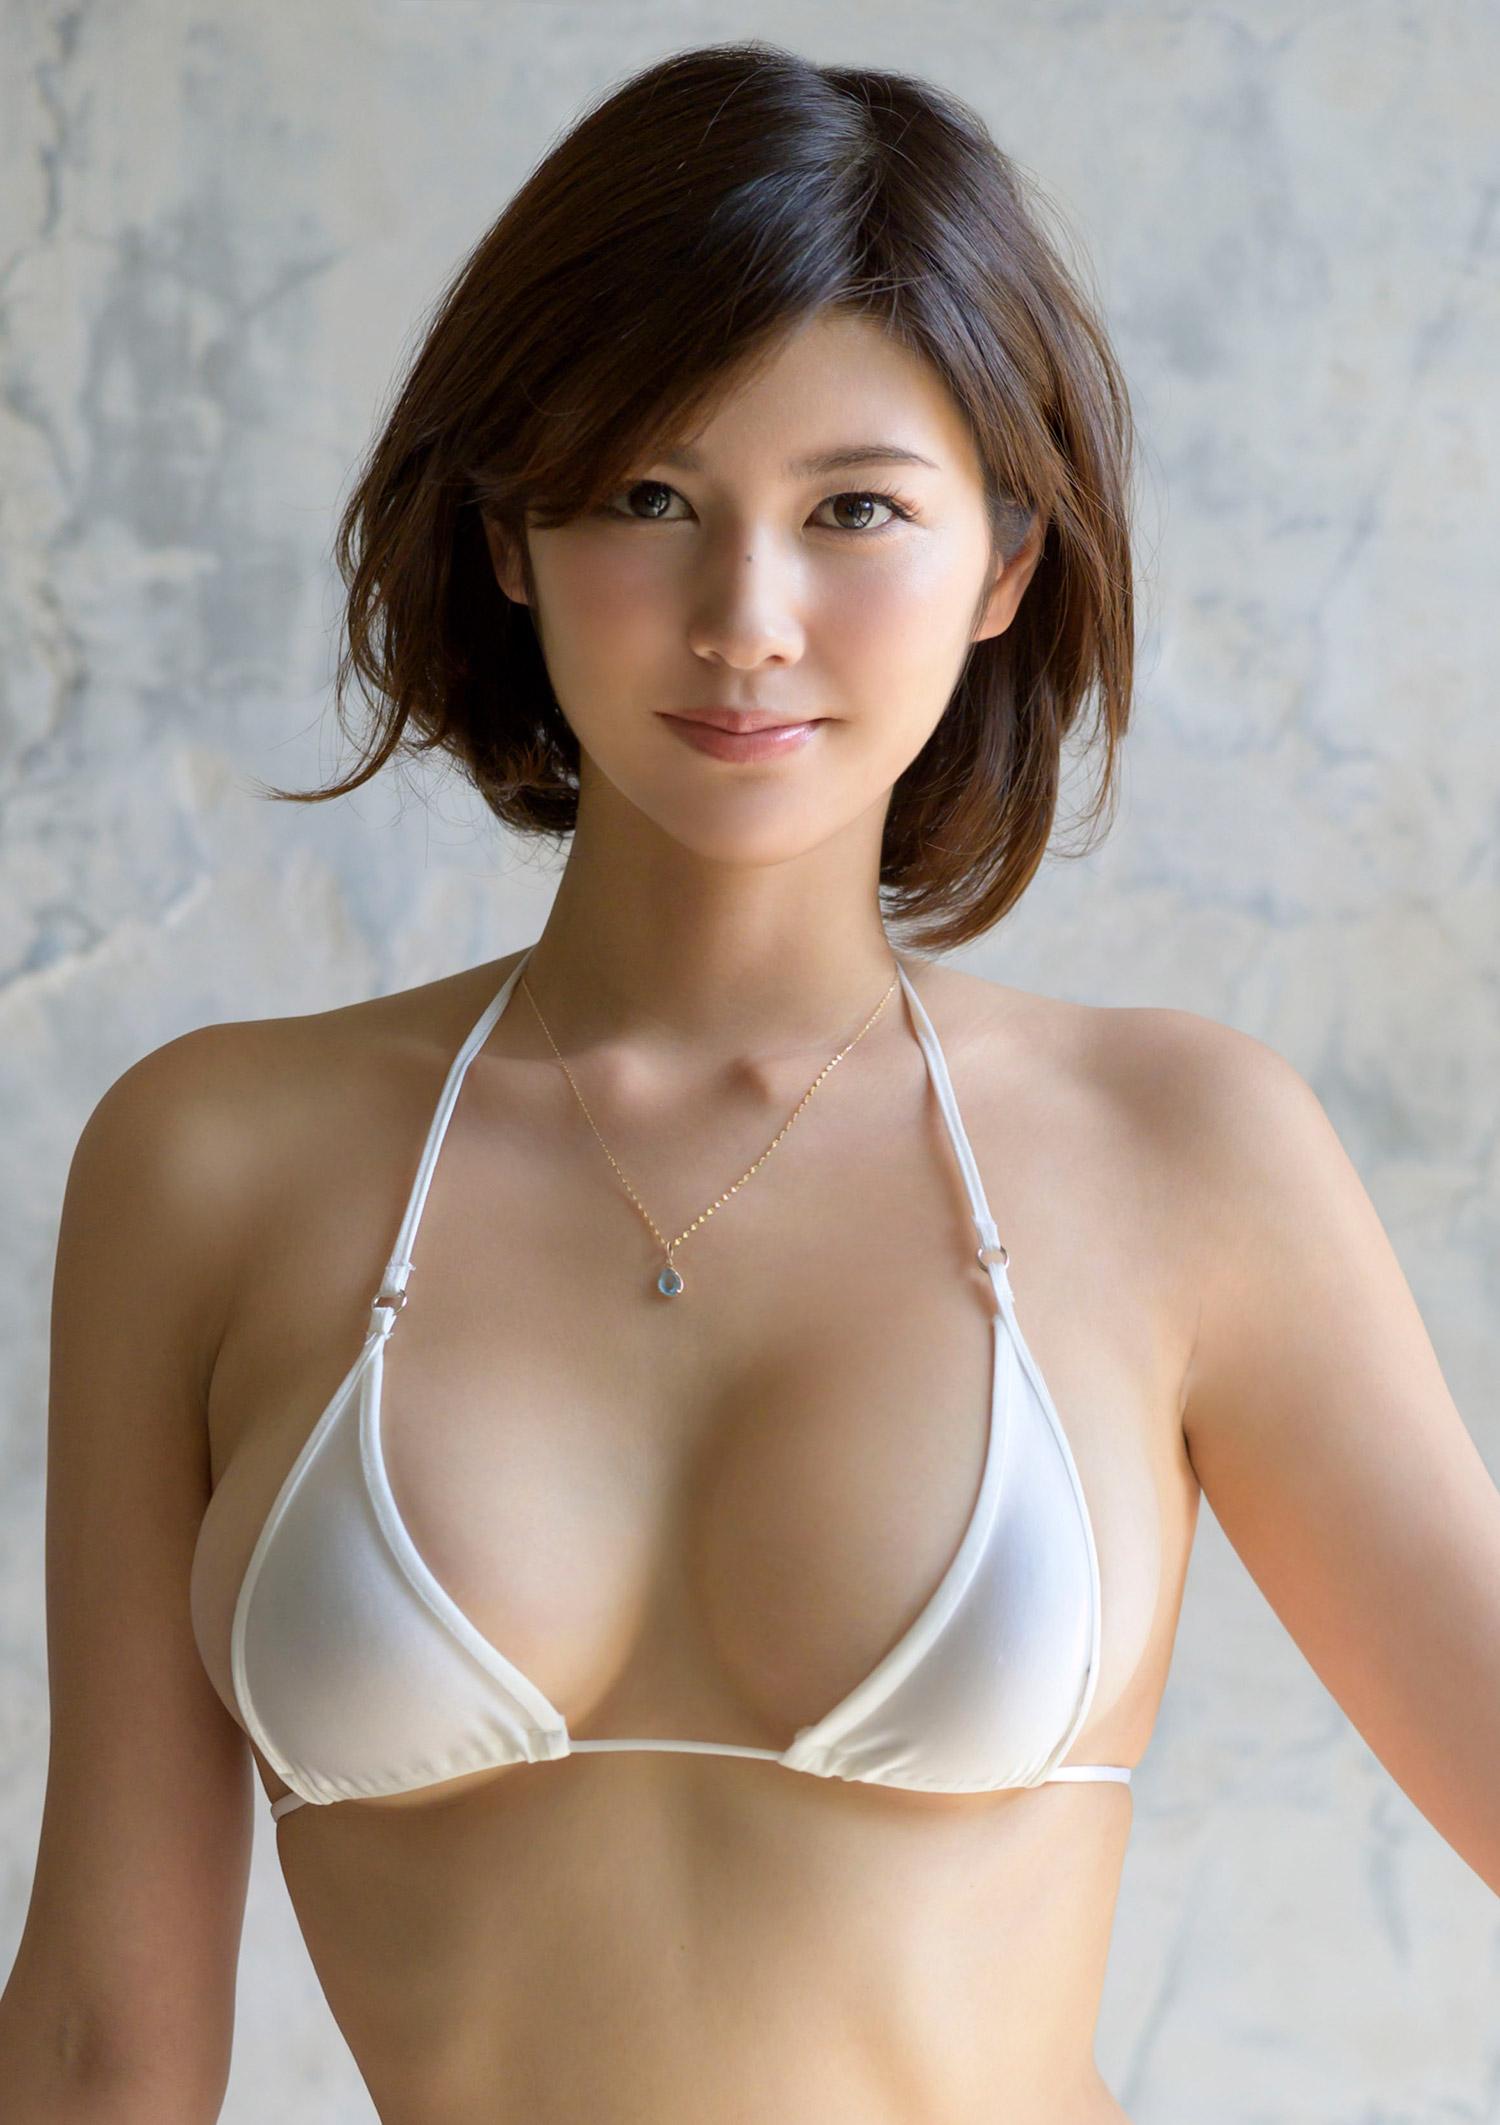 [DAHLIA] Mino Suzume 美乃 すずめ - ScanLover 2.0 - Discuss JAV & Asian Beauties!